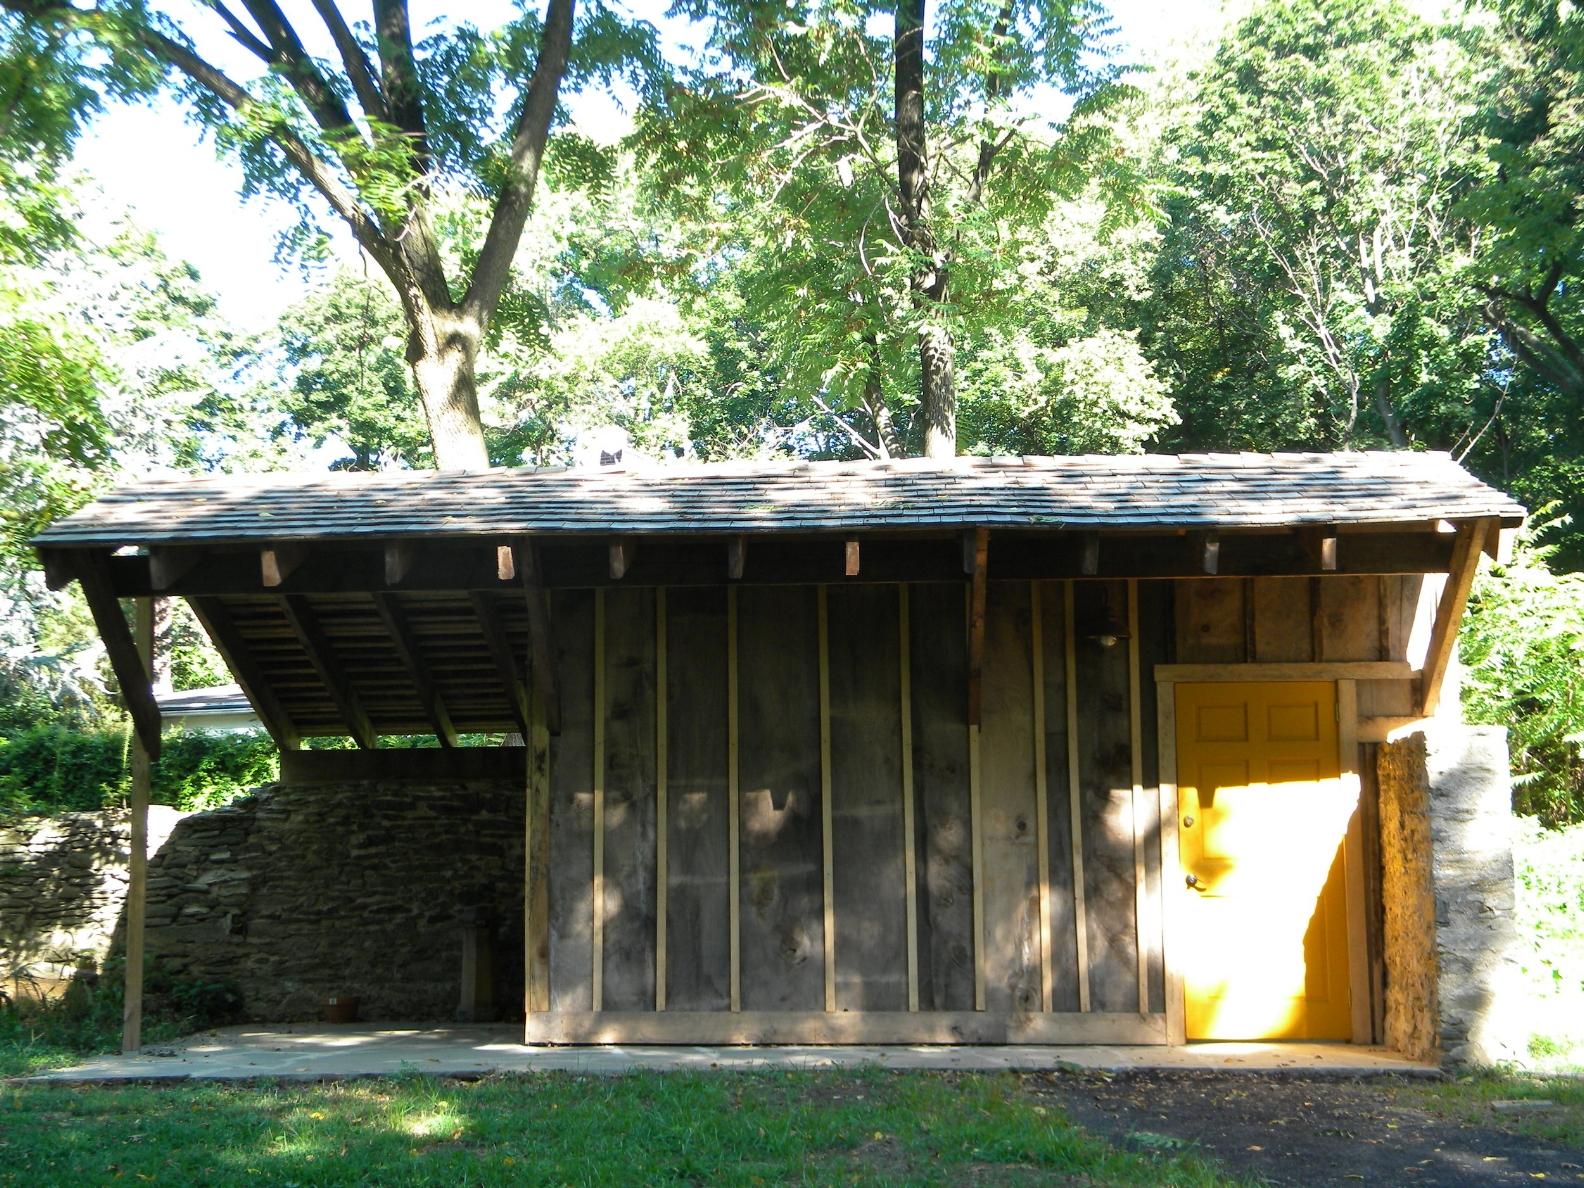 Meetinghouse Reclaimed Wood Outbuilding 2.jpg